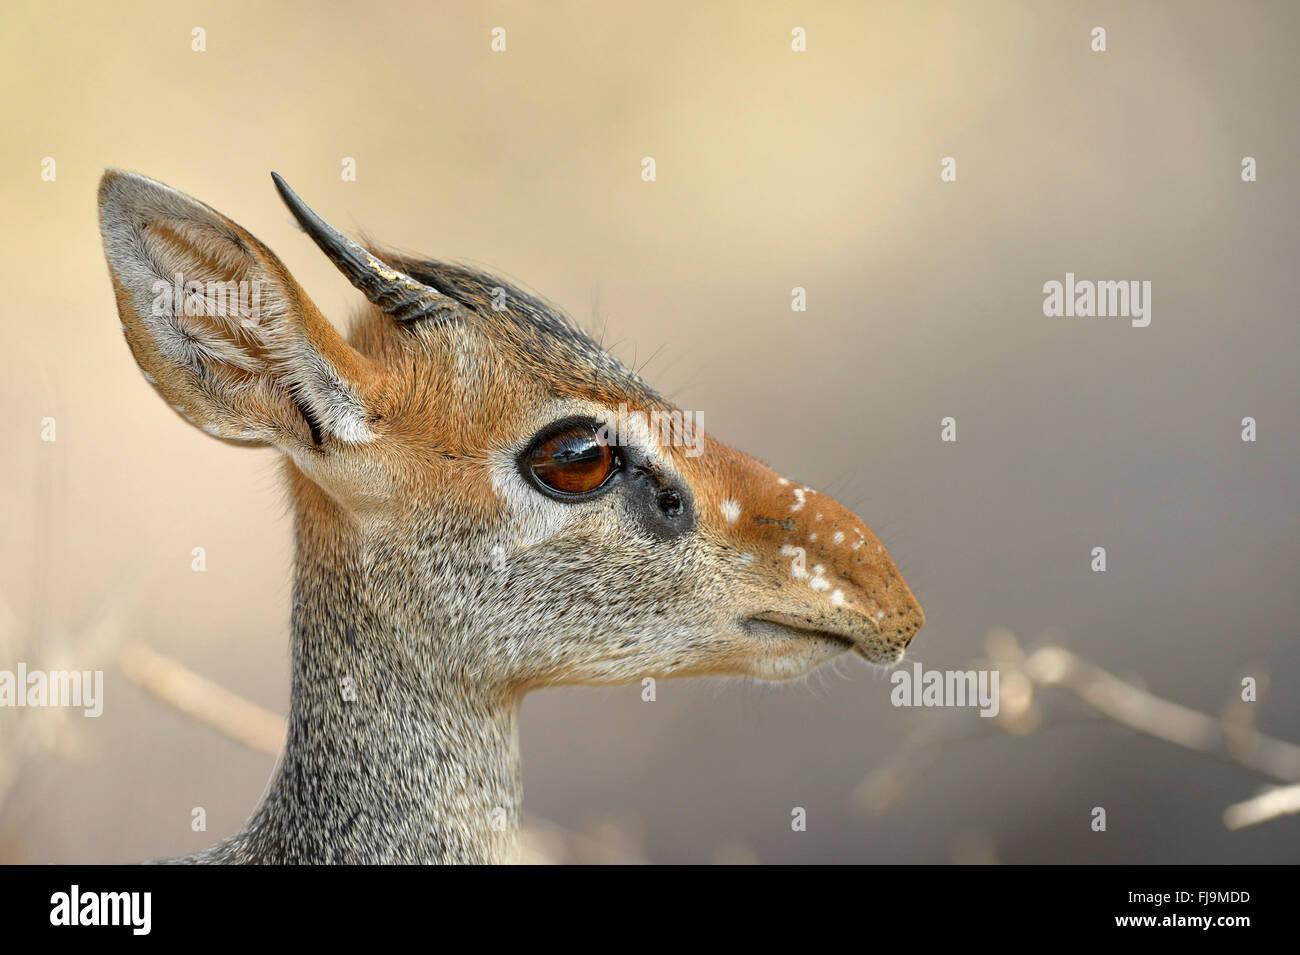 Kirk's Dikdik (Madoqua kirkii) close-up of head and neck, Shaba National Reserve, Kenya, October - Stock Image